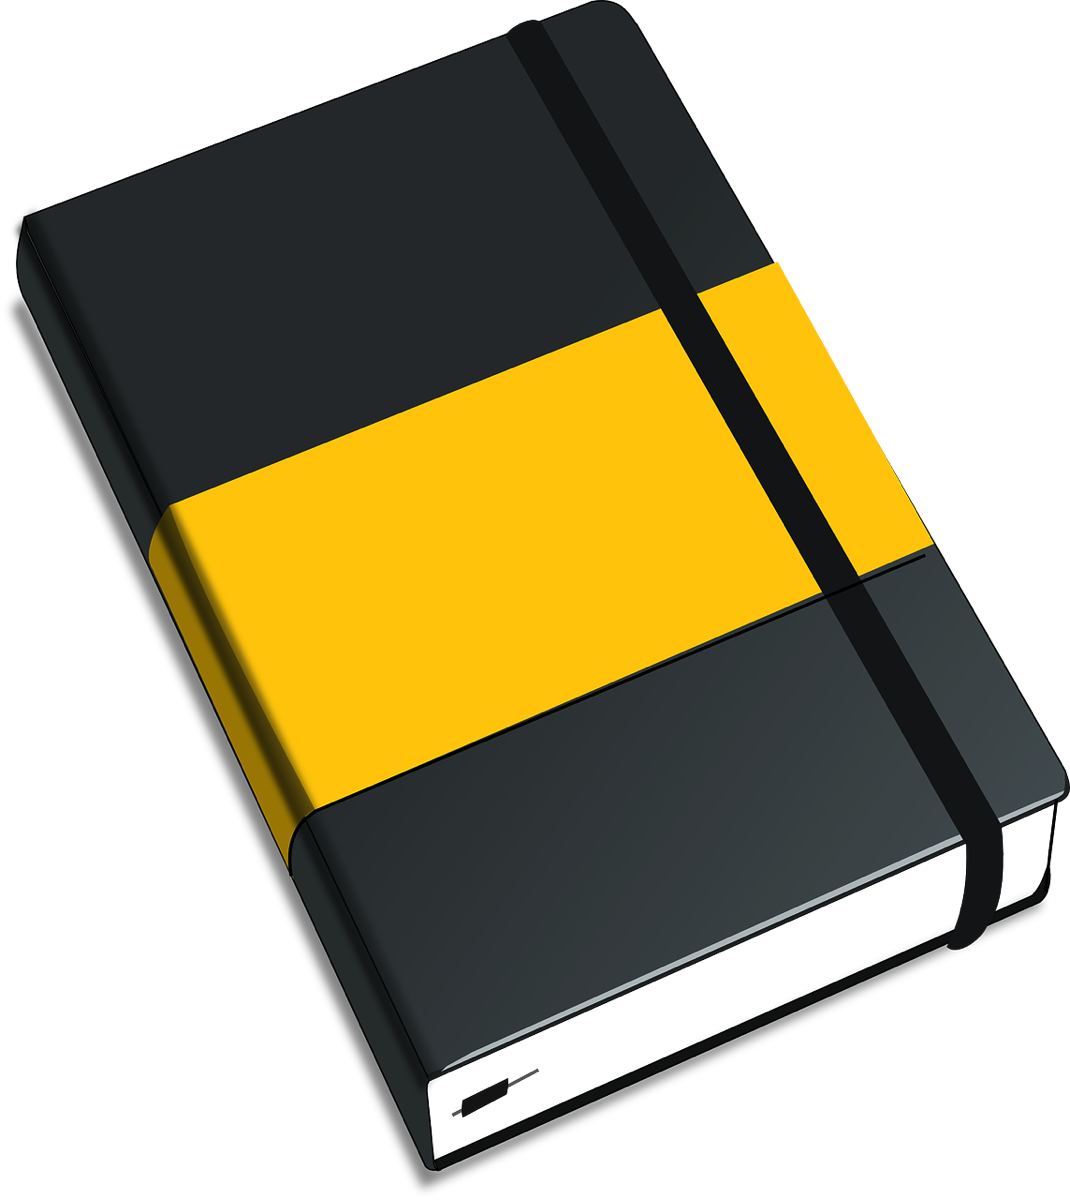 Sketchbook 156775 1280